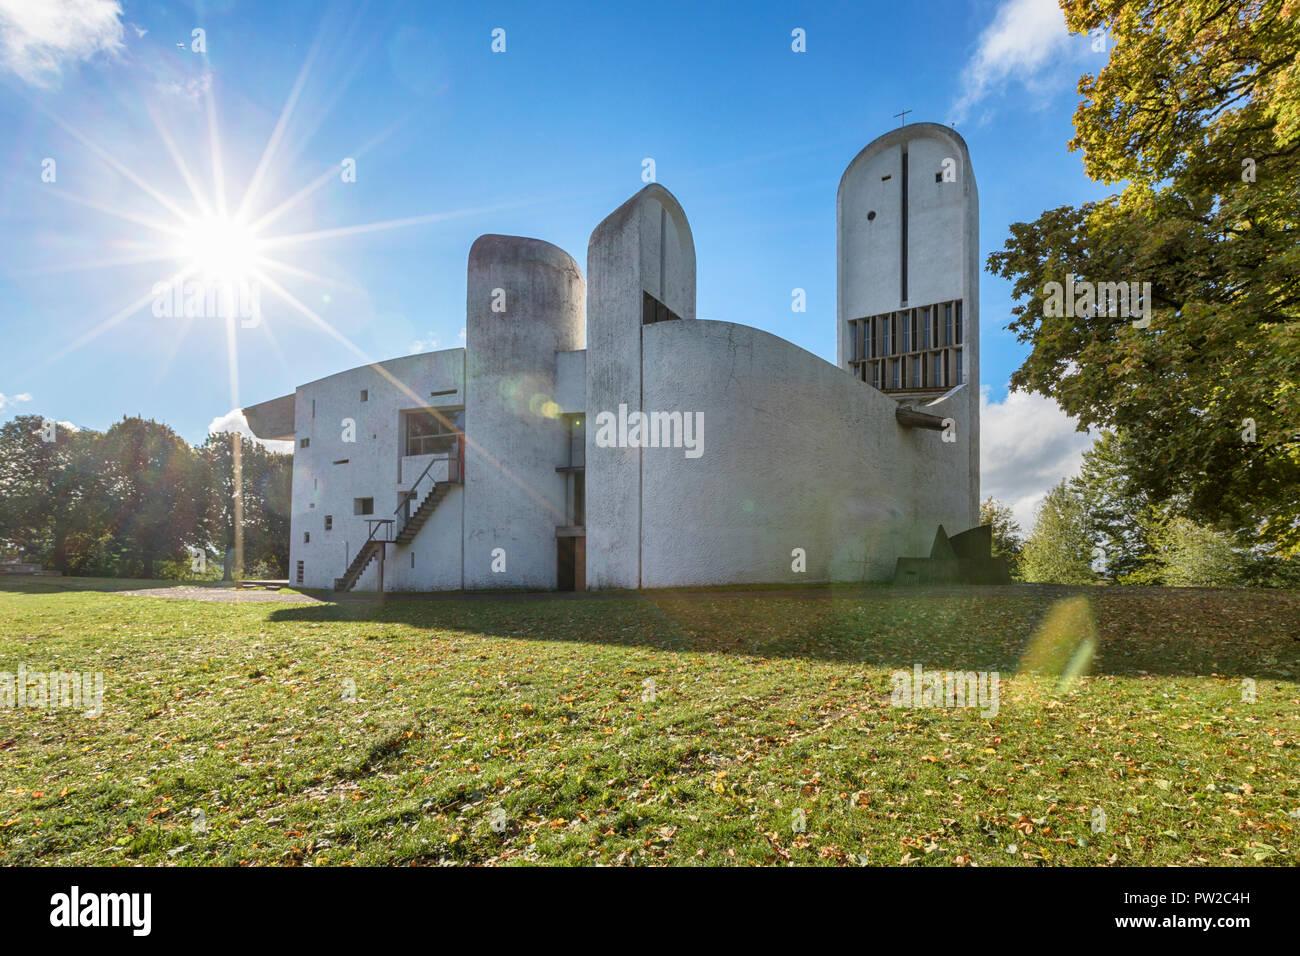 Chapel of Notre Dame du Haut built by architect Le Corbusier in 1955 at Ronchamp, Bourgogne-Franche-Comté, France. Nort-Western view agaisnt morning s Stock Photo